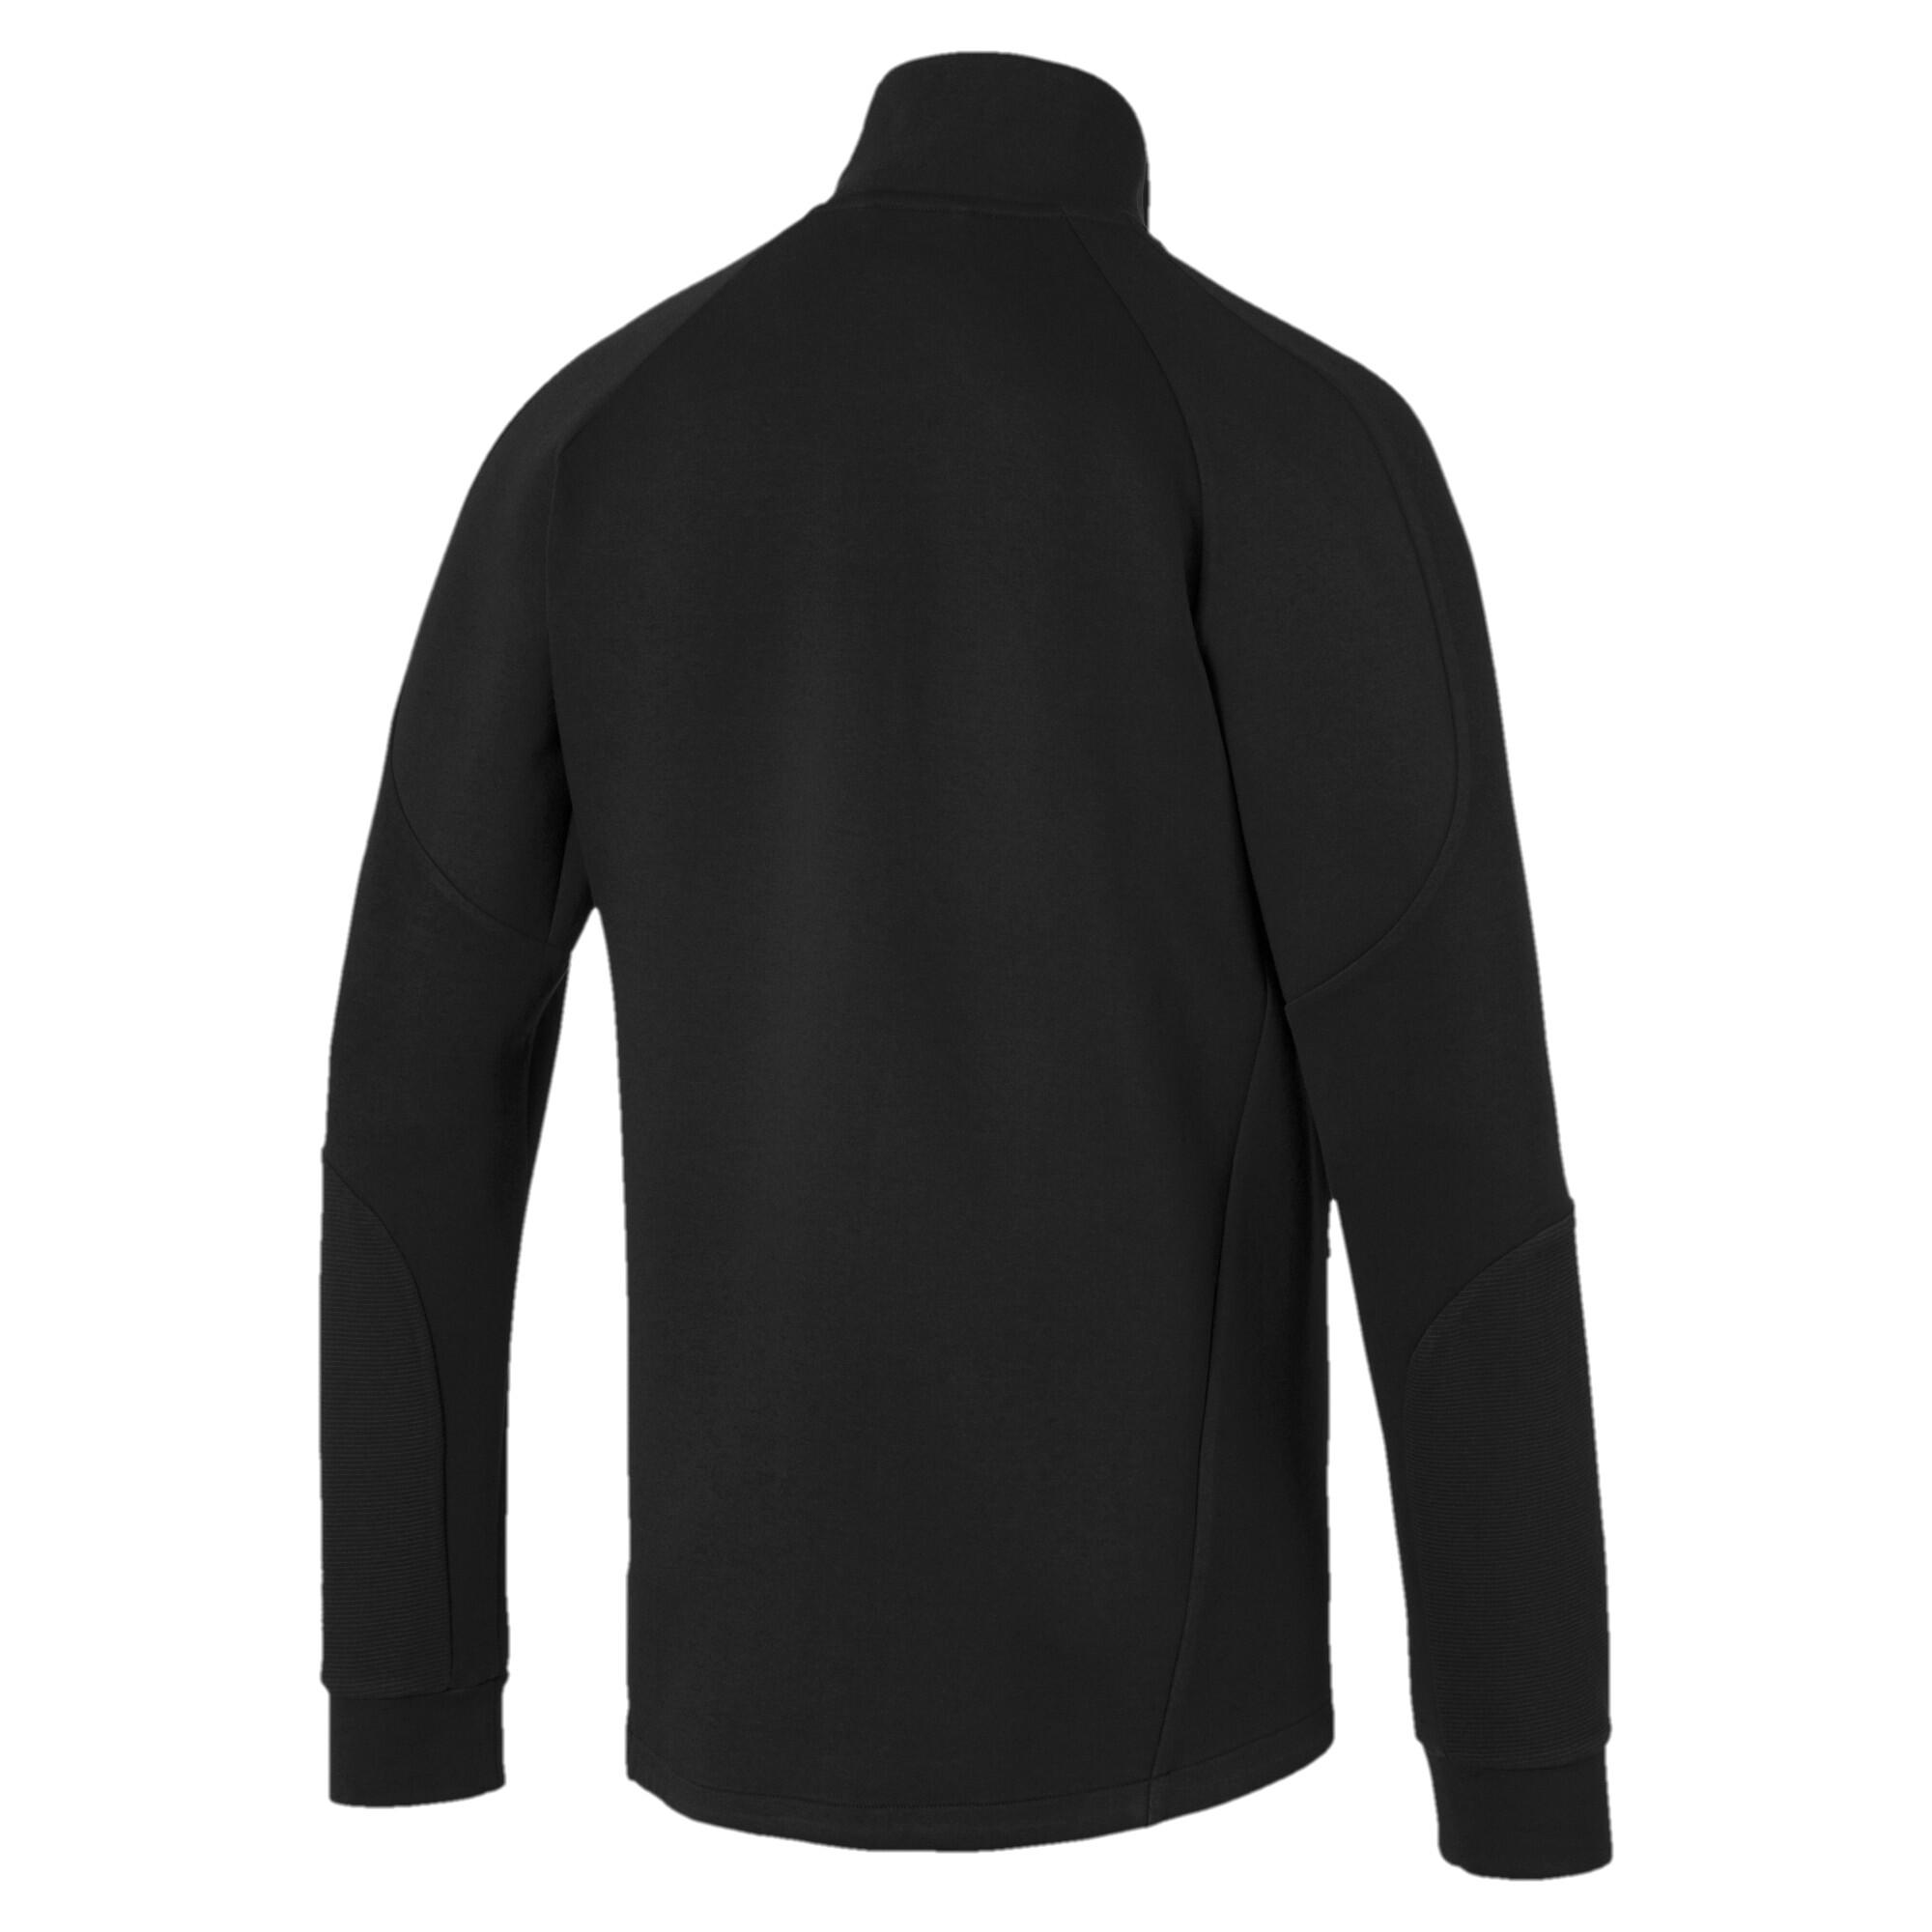 PUMA-Evostripe-Men-039-s-Jacket-Men-Sweat-Basics thumbnail 3